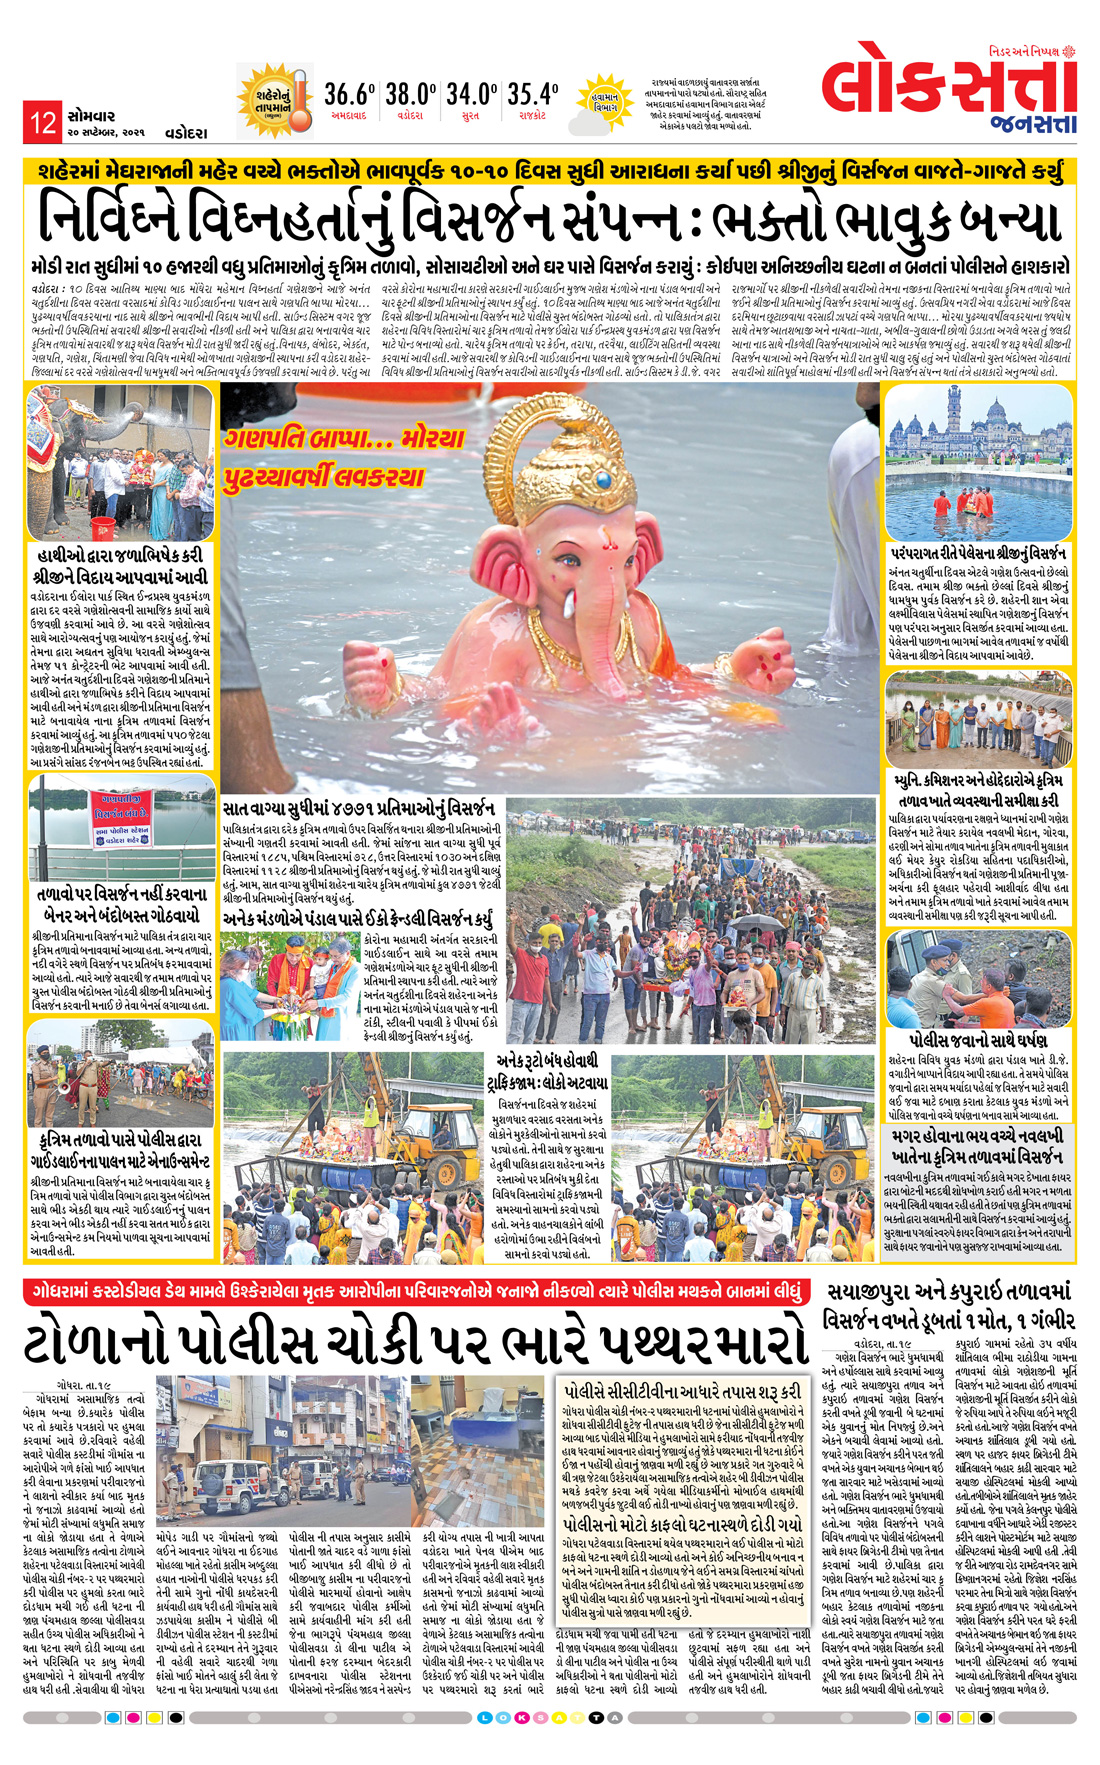 Loksatta Jansatta News Papaer E-paper dated 2021-09-20 | Page 12